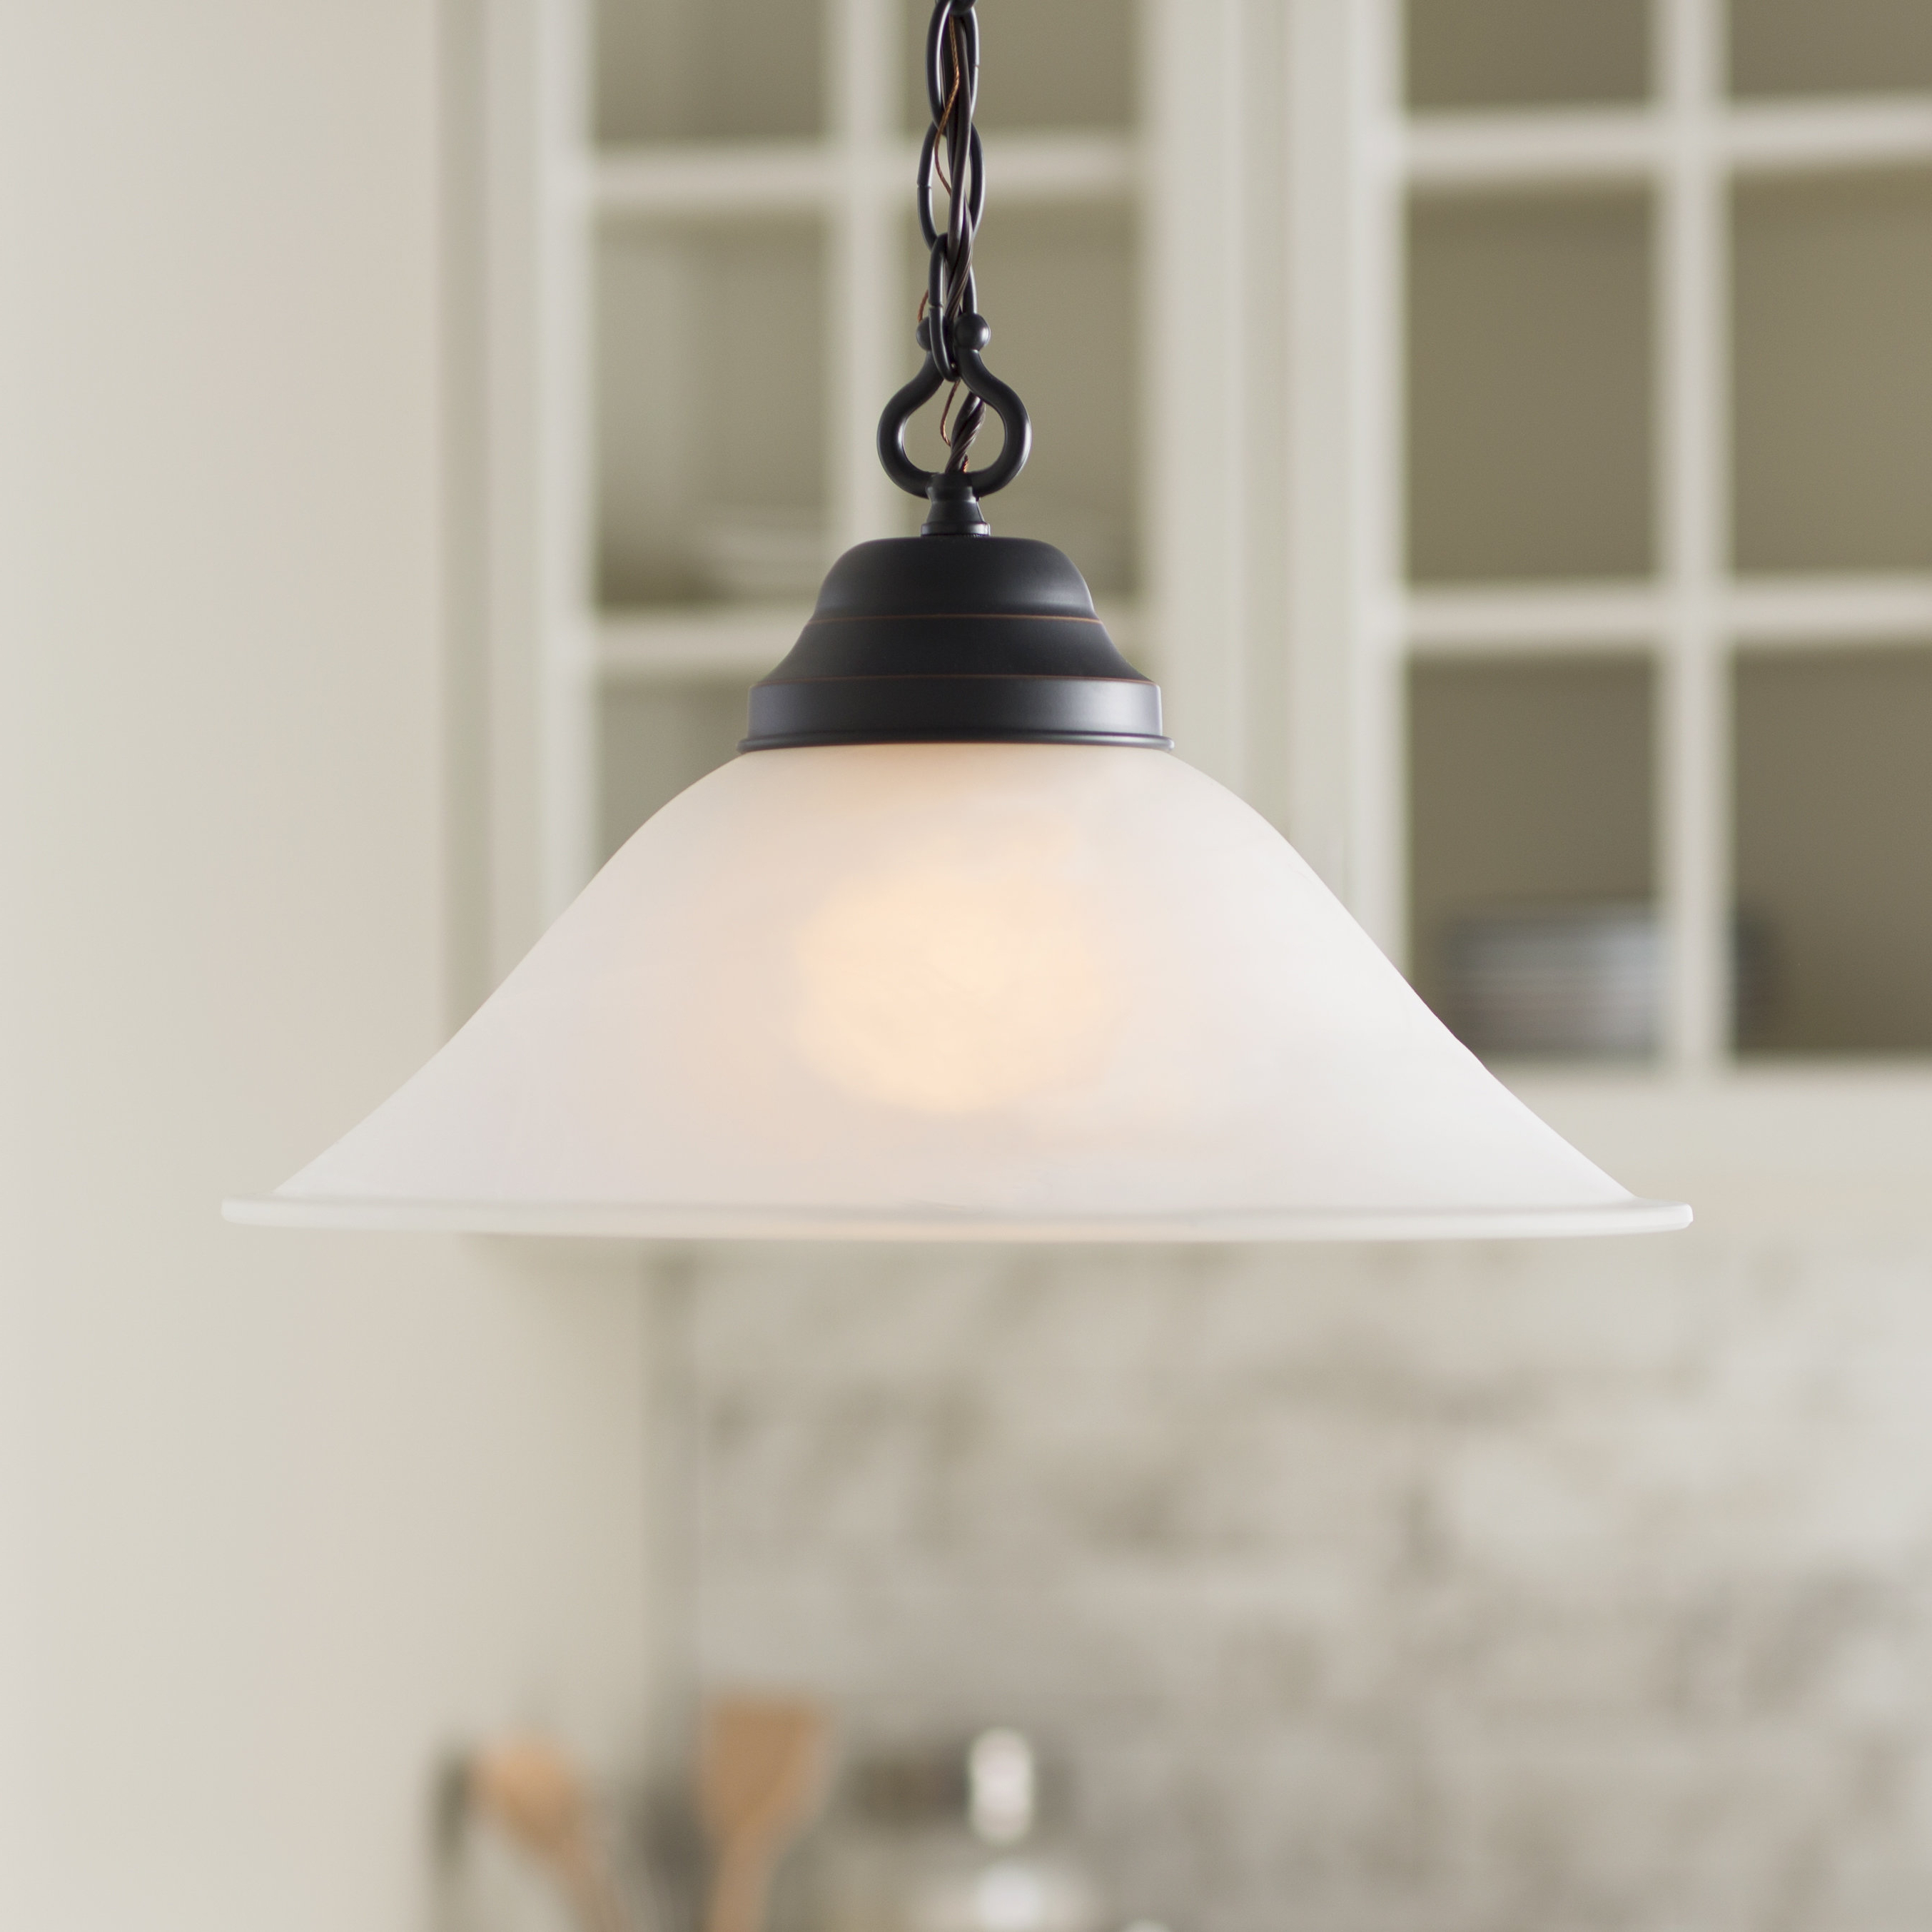 Grullon Scroll 1 Light Single Bell Pendants Inside Well Known Farmhouse & Rustic Fleur De Lis Living Pendants (View 6 of 20)